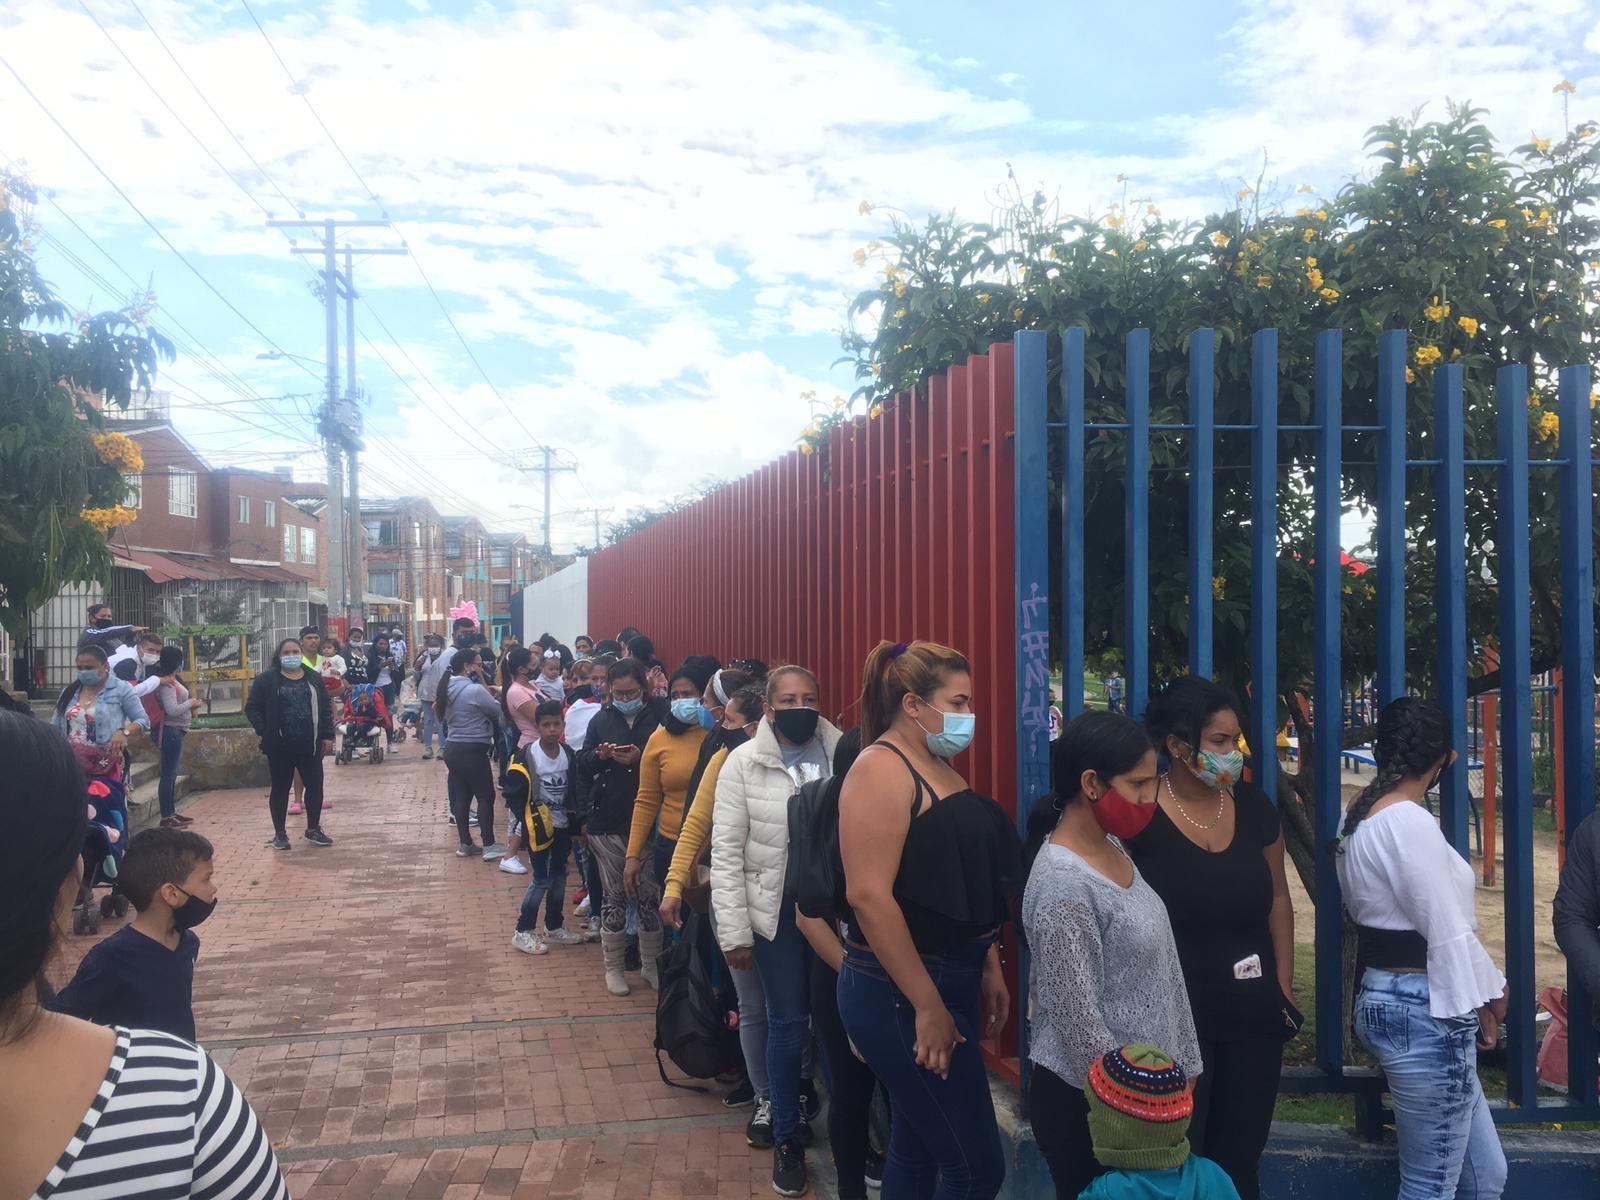 Venezuelan refugees in Colombia organize to streamline international aid